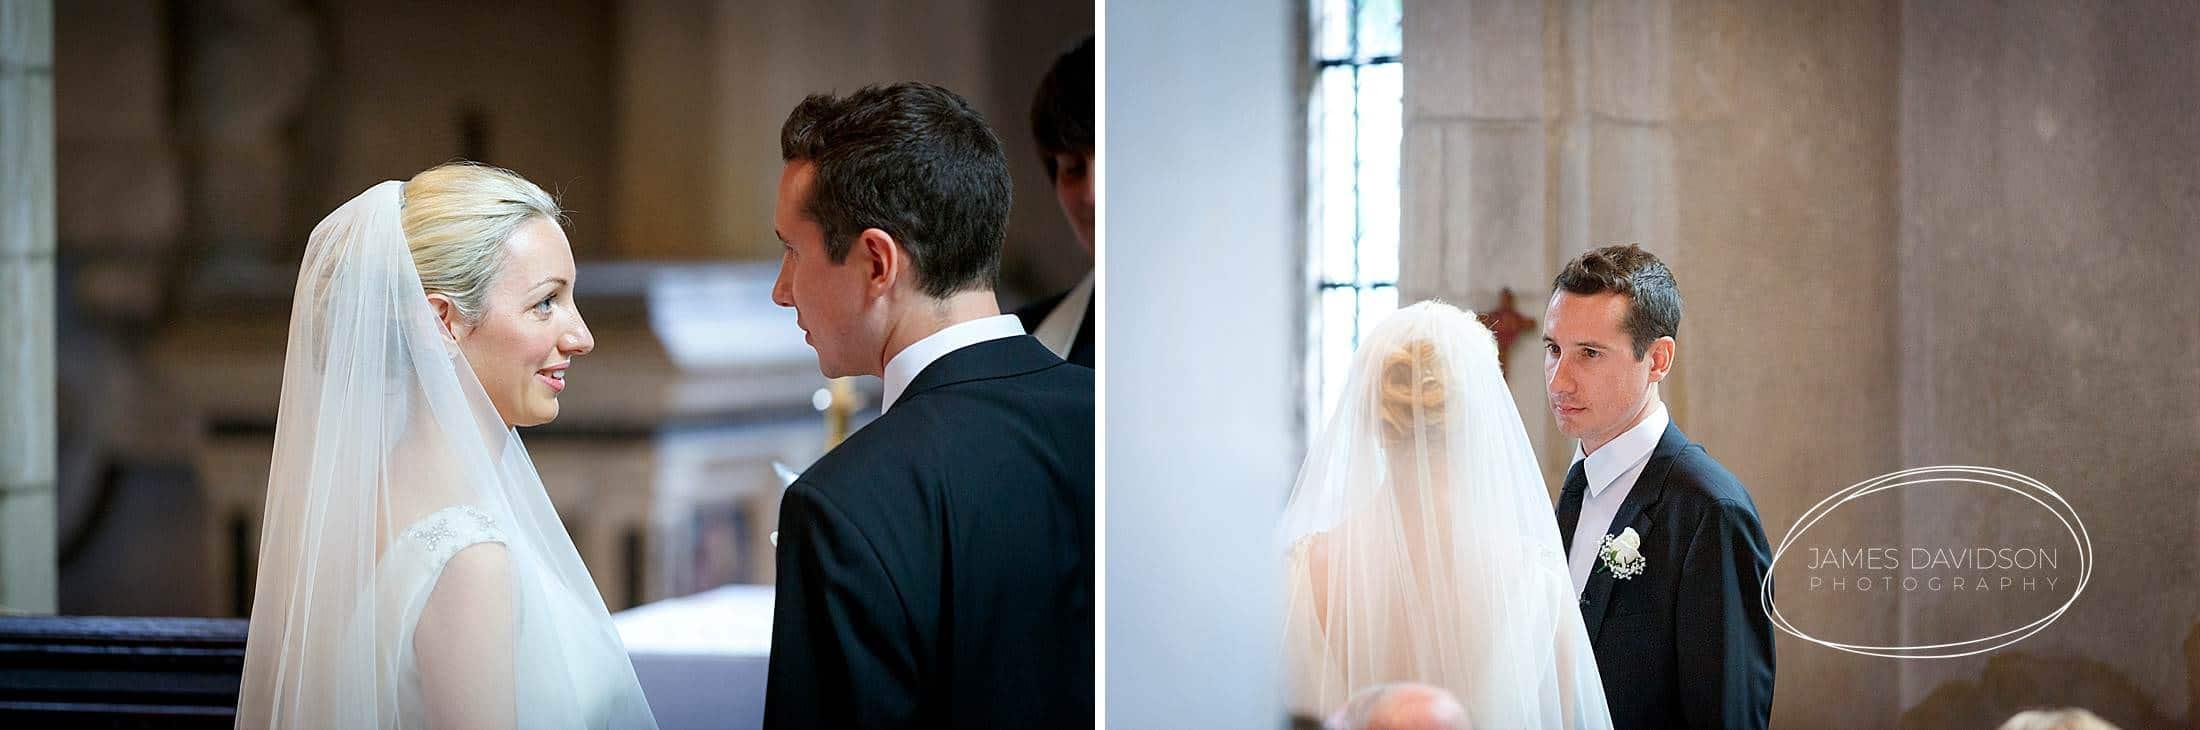 hengrave-hall-summer-wedding-045